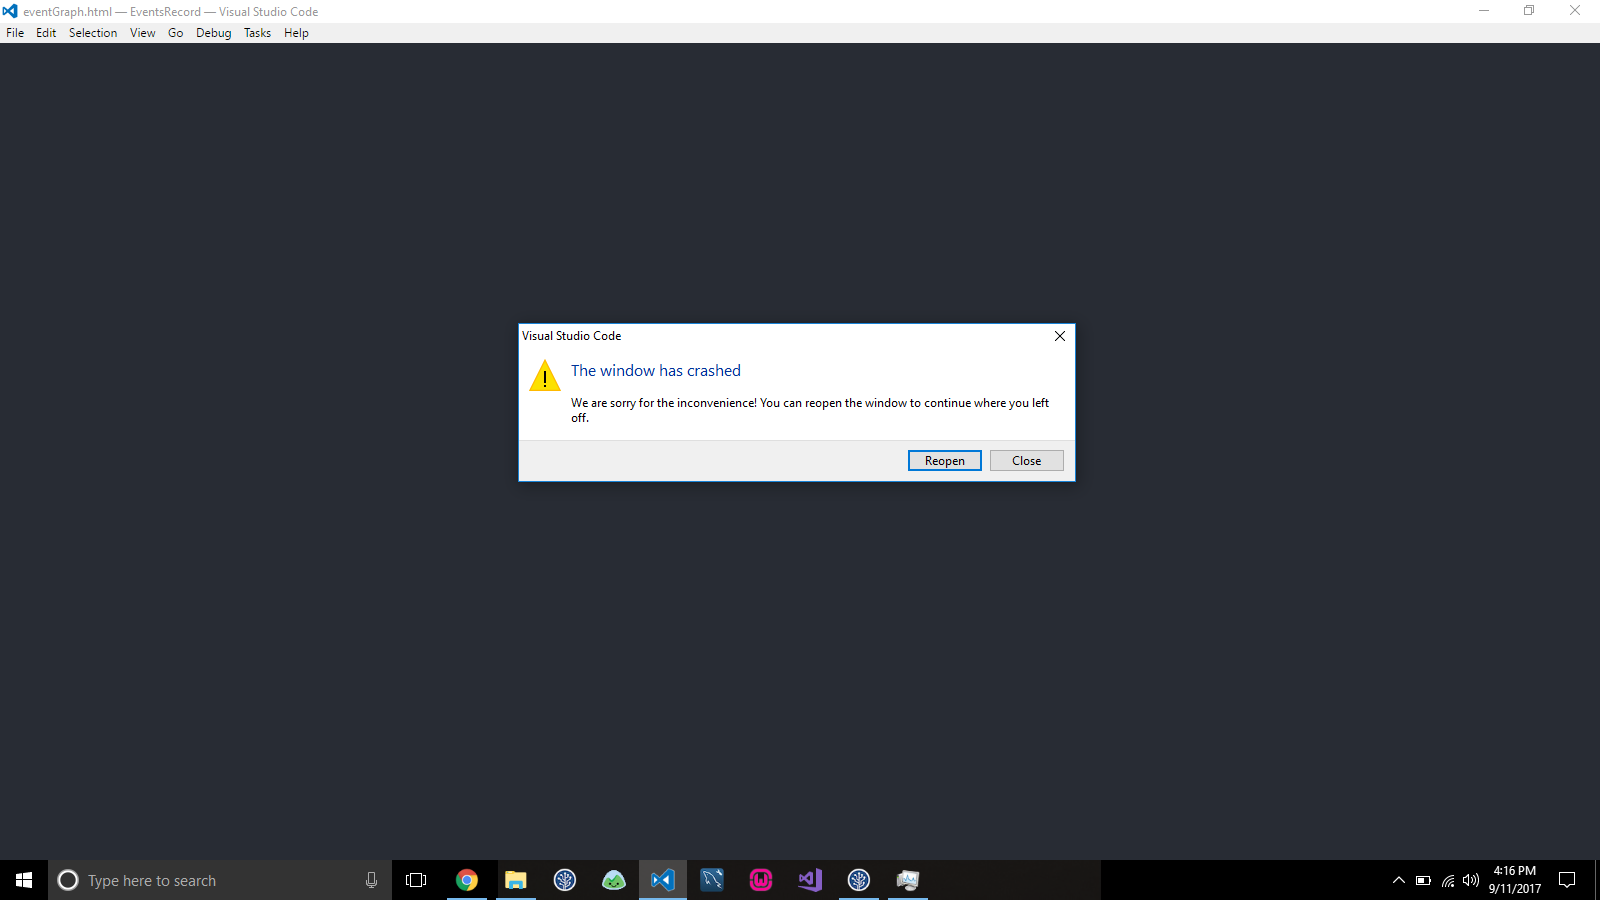 Visual studio code keep crashing on windows 10 after latest